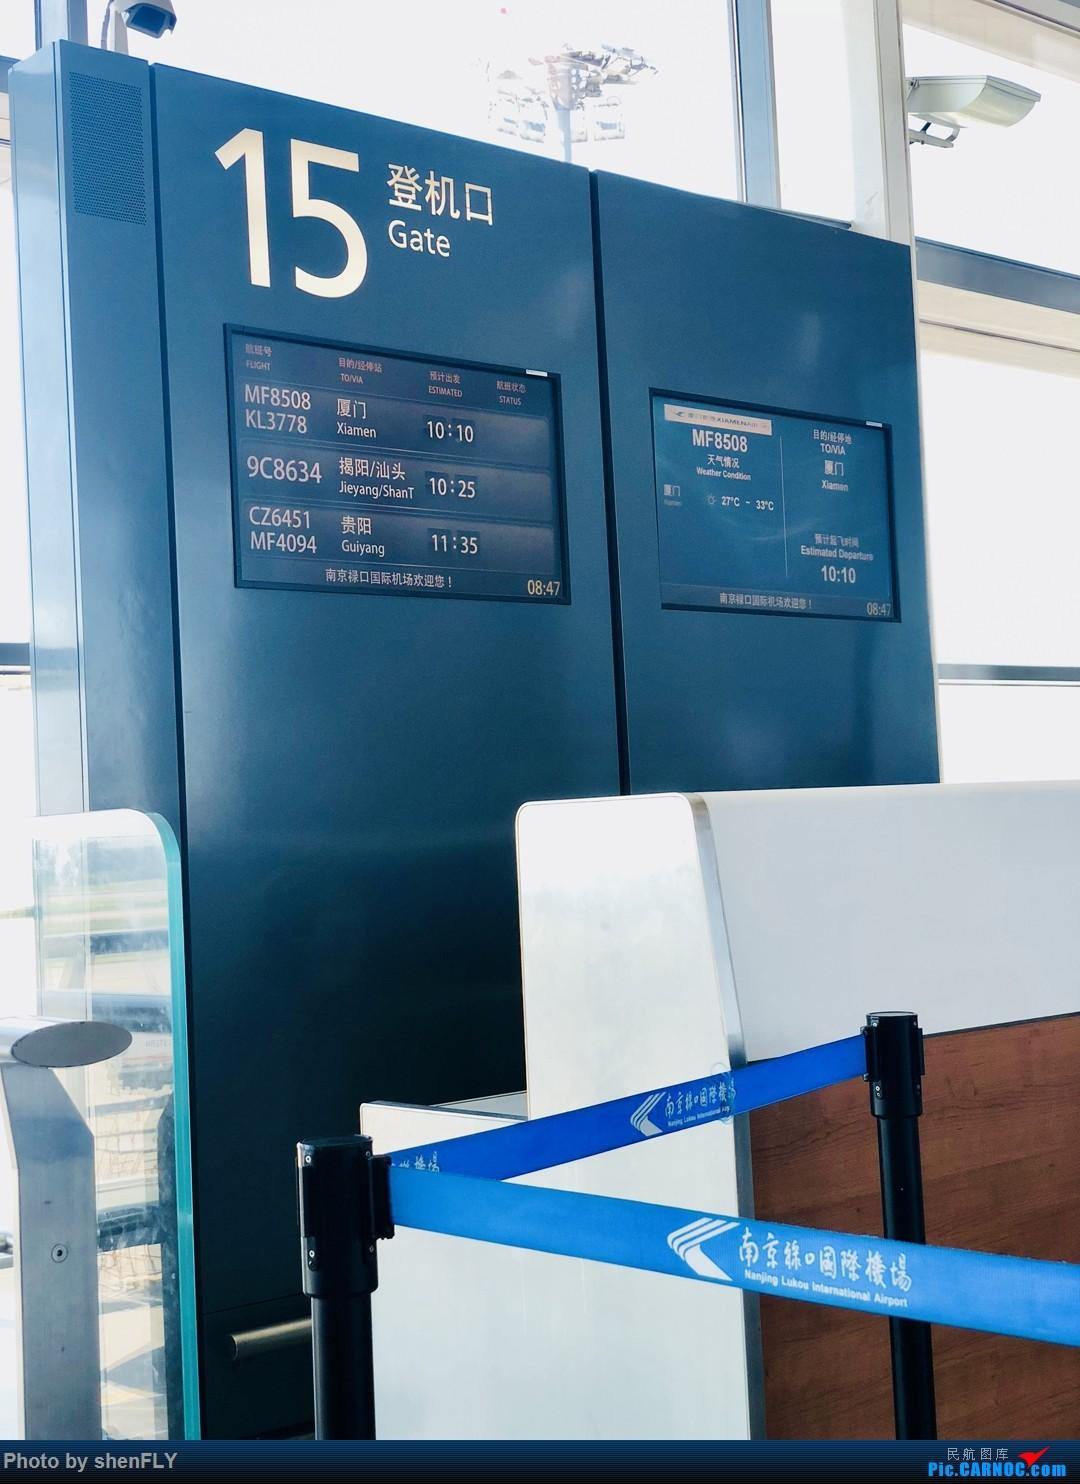 Re:[原创]【B737-8M】蓝天白云中体验厦航737MAX8 NKG-XMN 有起降高清视频 BOEING 737MAX-8 B-1289 中国南京禄口国际机场 中国南京禄口国际机场